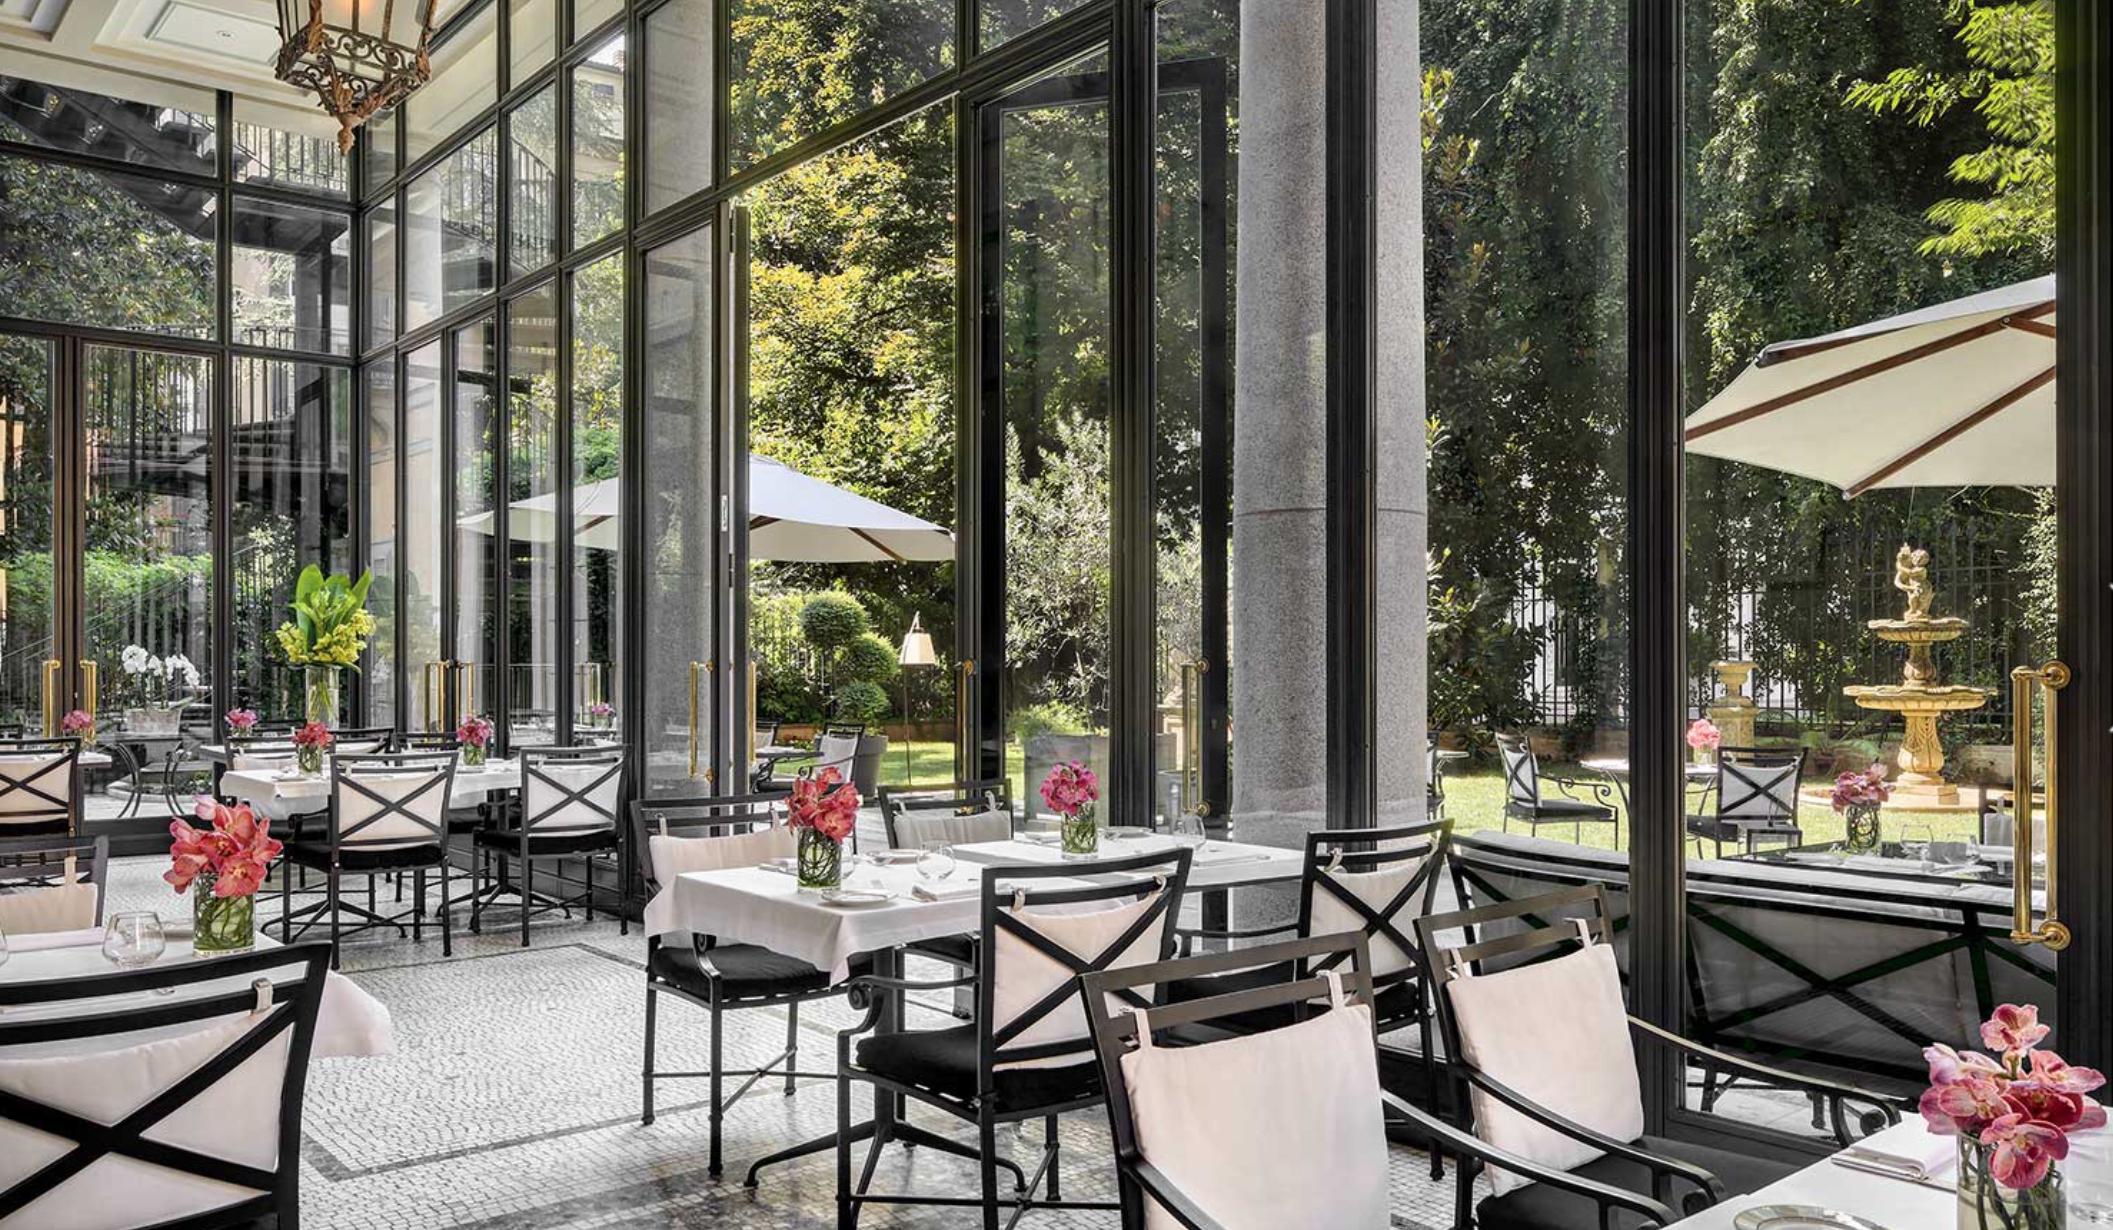 Destination: Milan, Italy